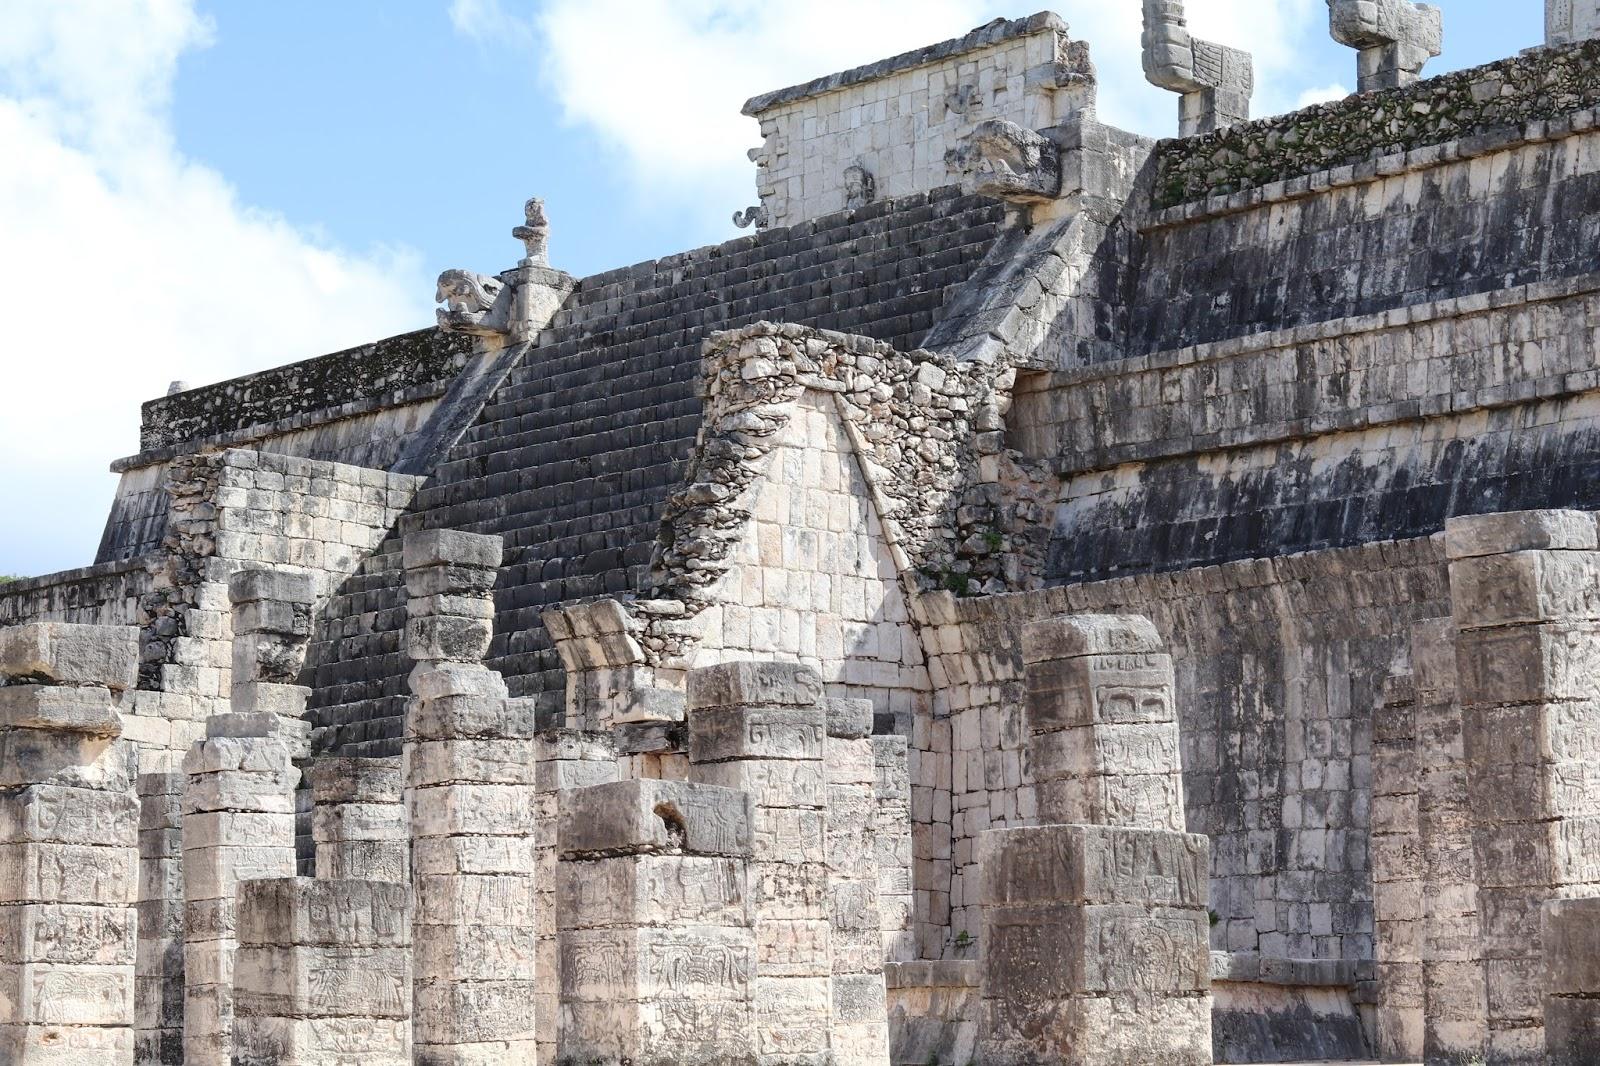 chichen itza mayan ruins, mayan ruins, chichen itza